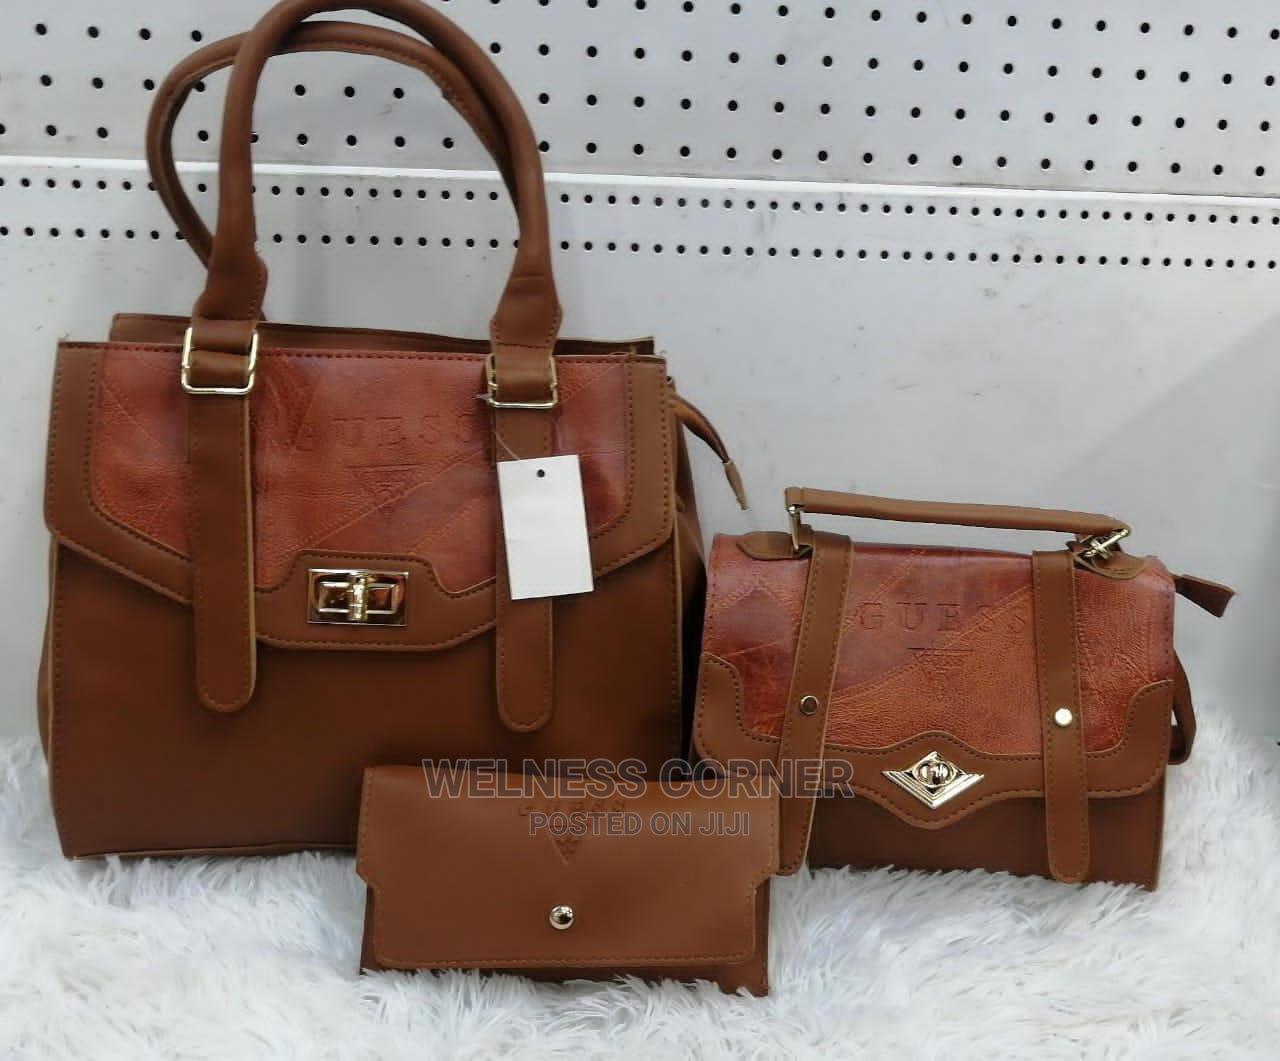 Ladies Hand Bag 3 Pieces   Bags for sale in Arada, Addis Ababa, Ethiopia